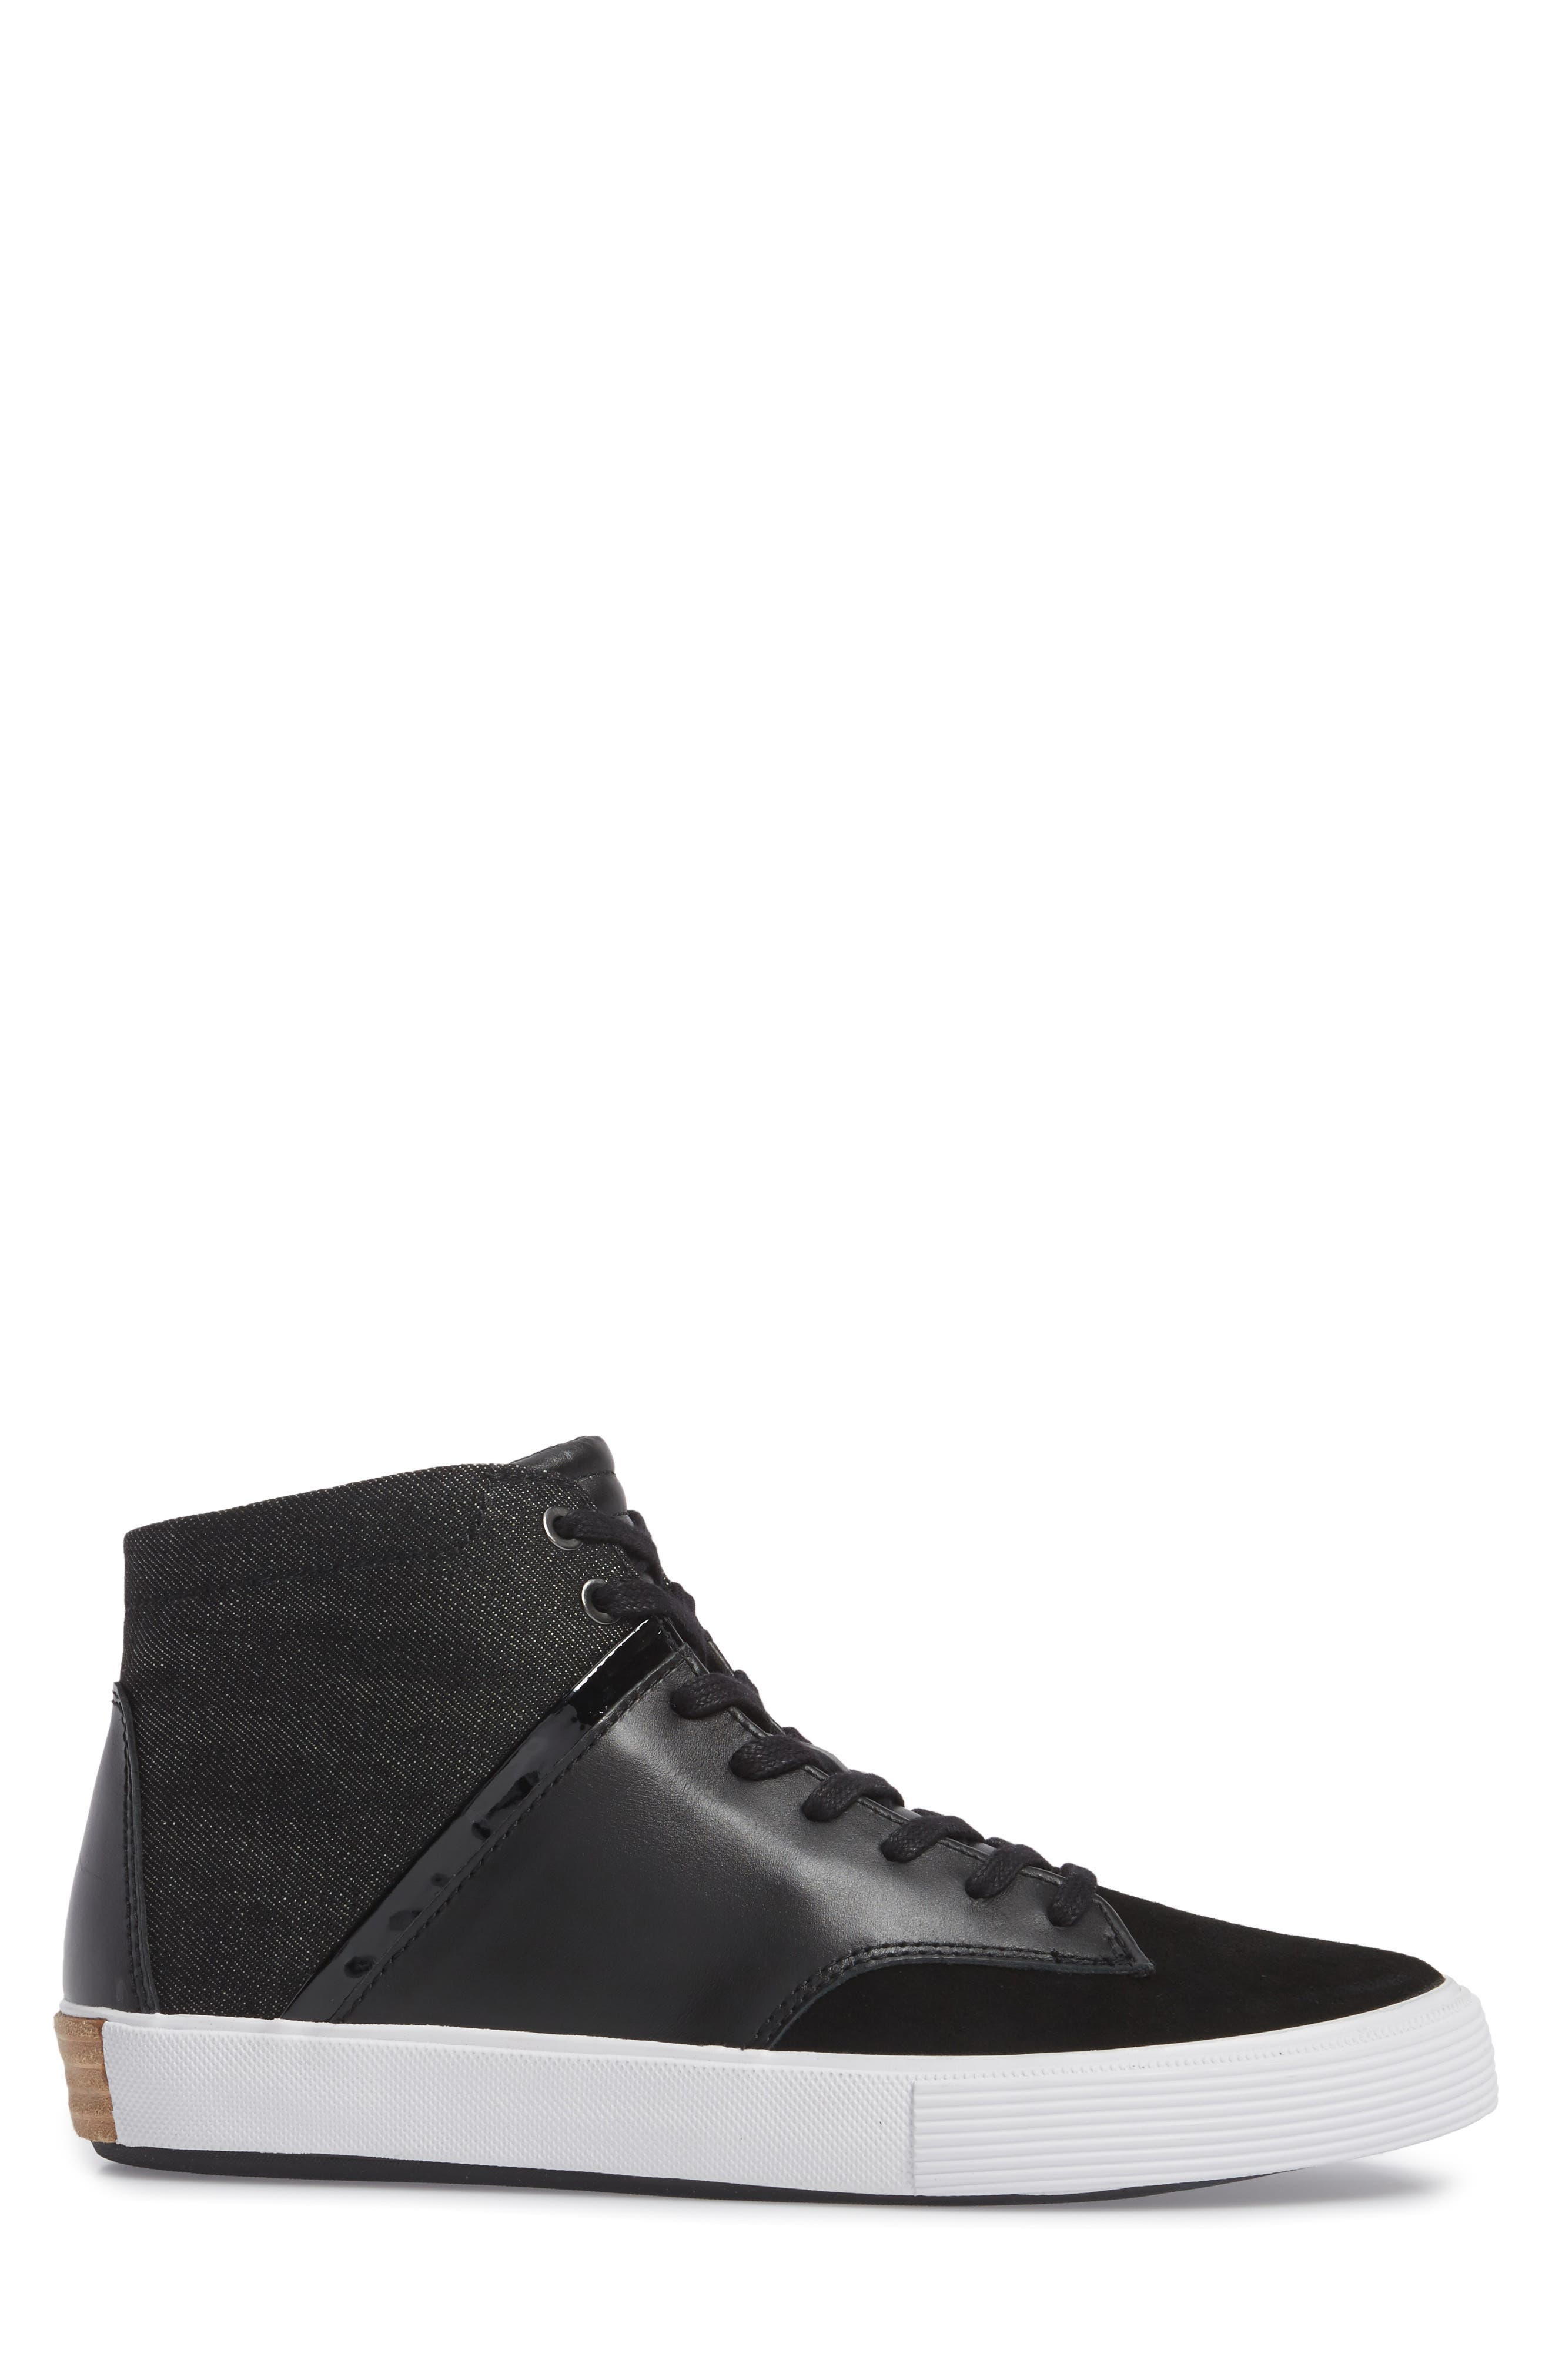 Joe Mac High Top Sneaker,                             Alternate thumbnail 3, color,                             001